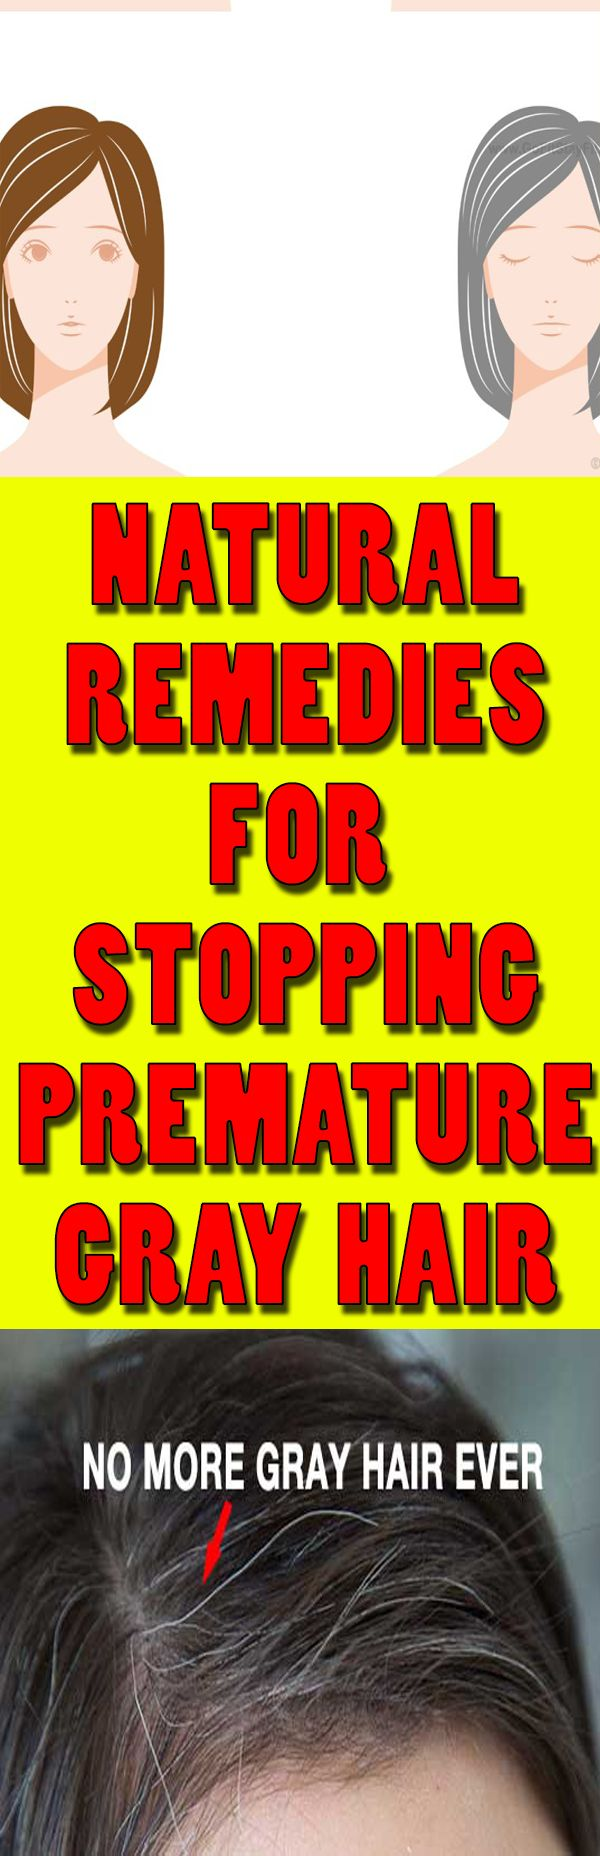 Natural Remedies for Premature Graying of Hair #grayhair #stop #homeremedies